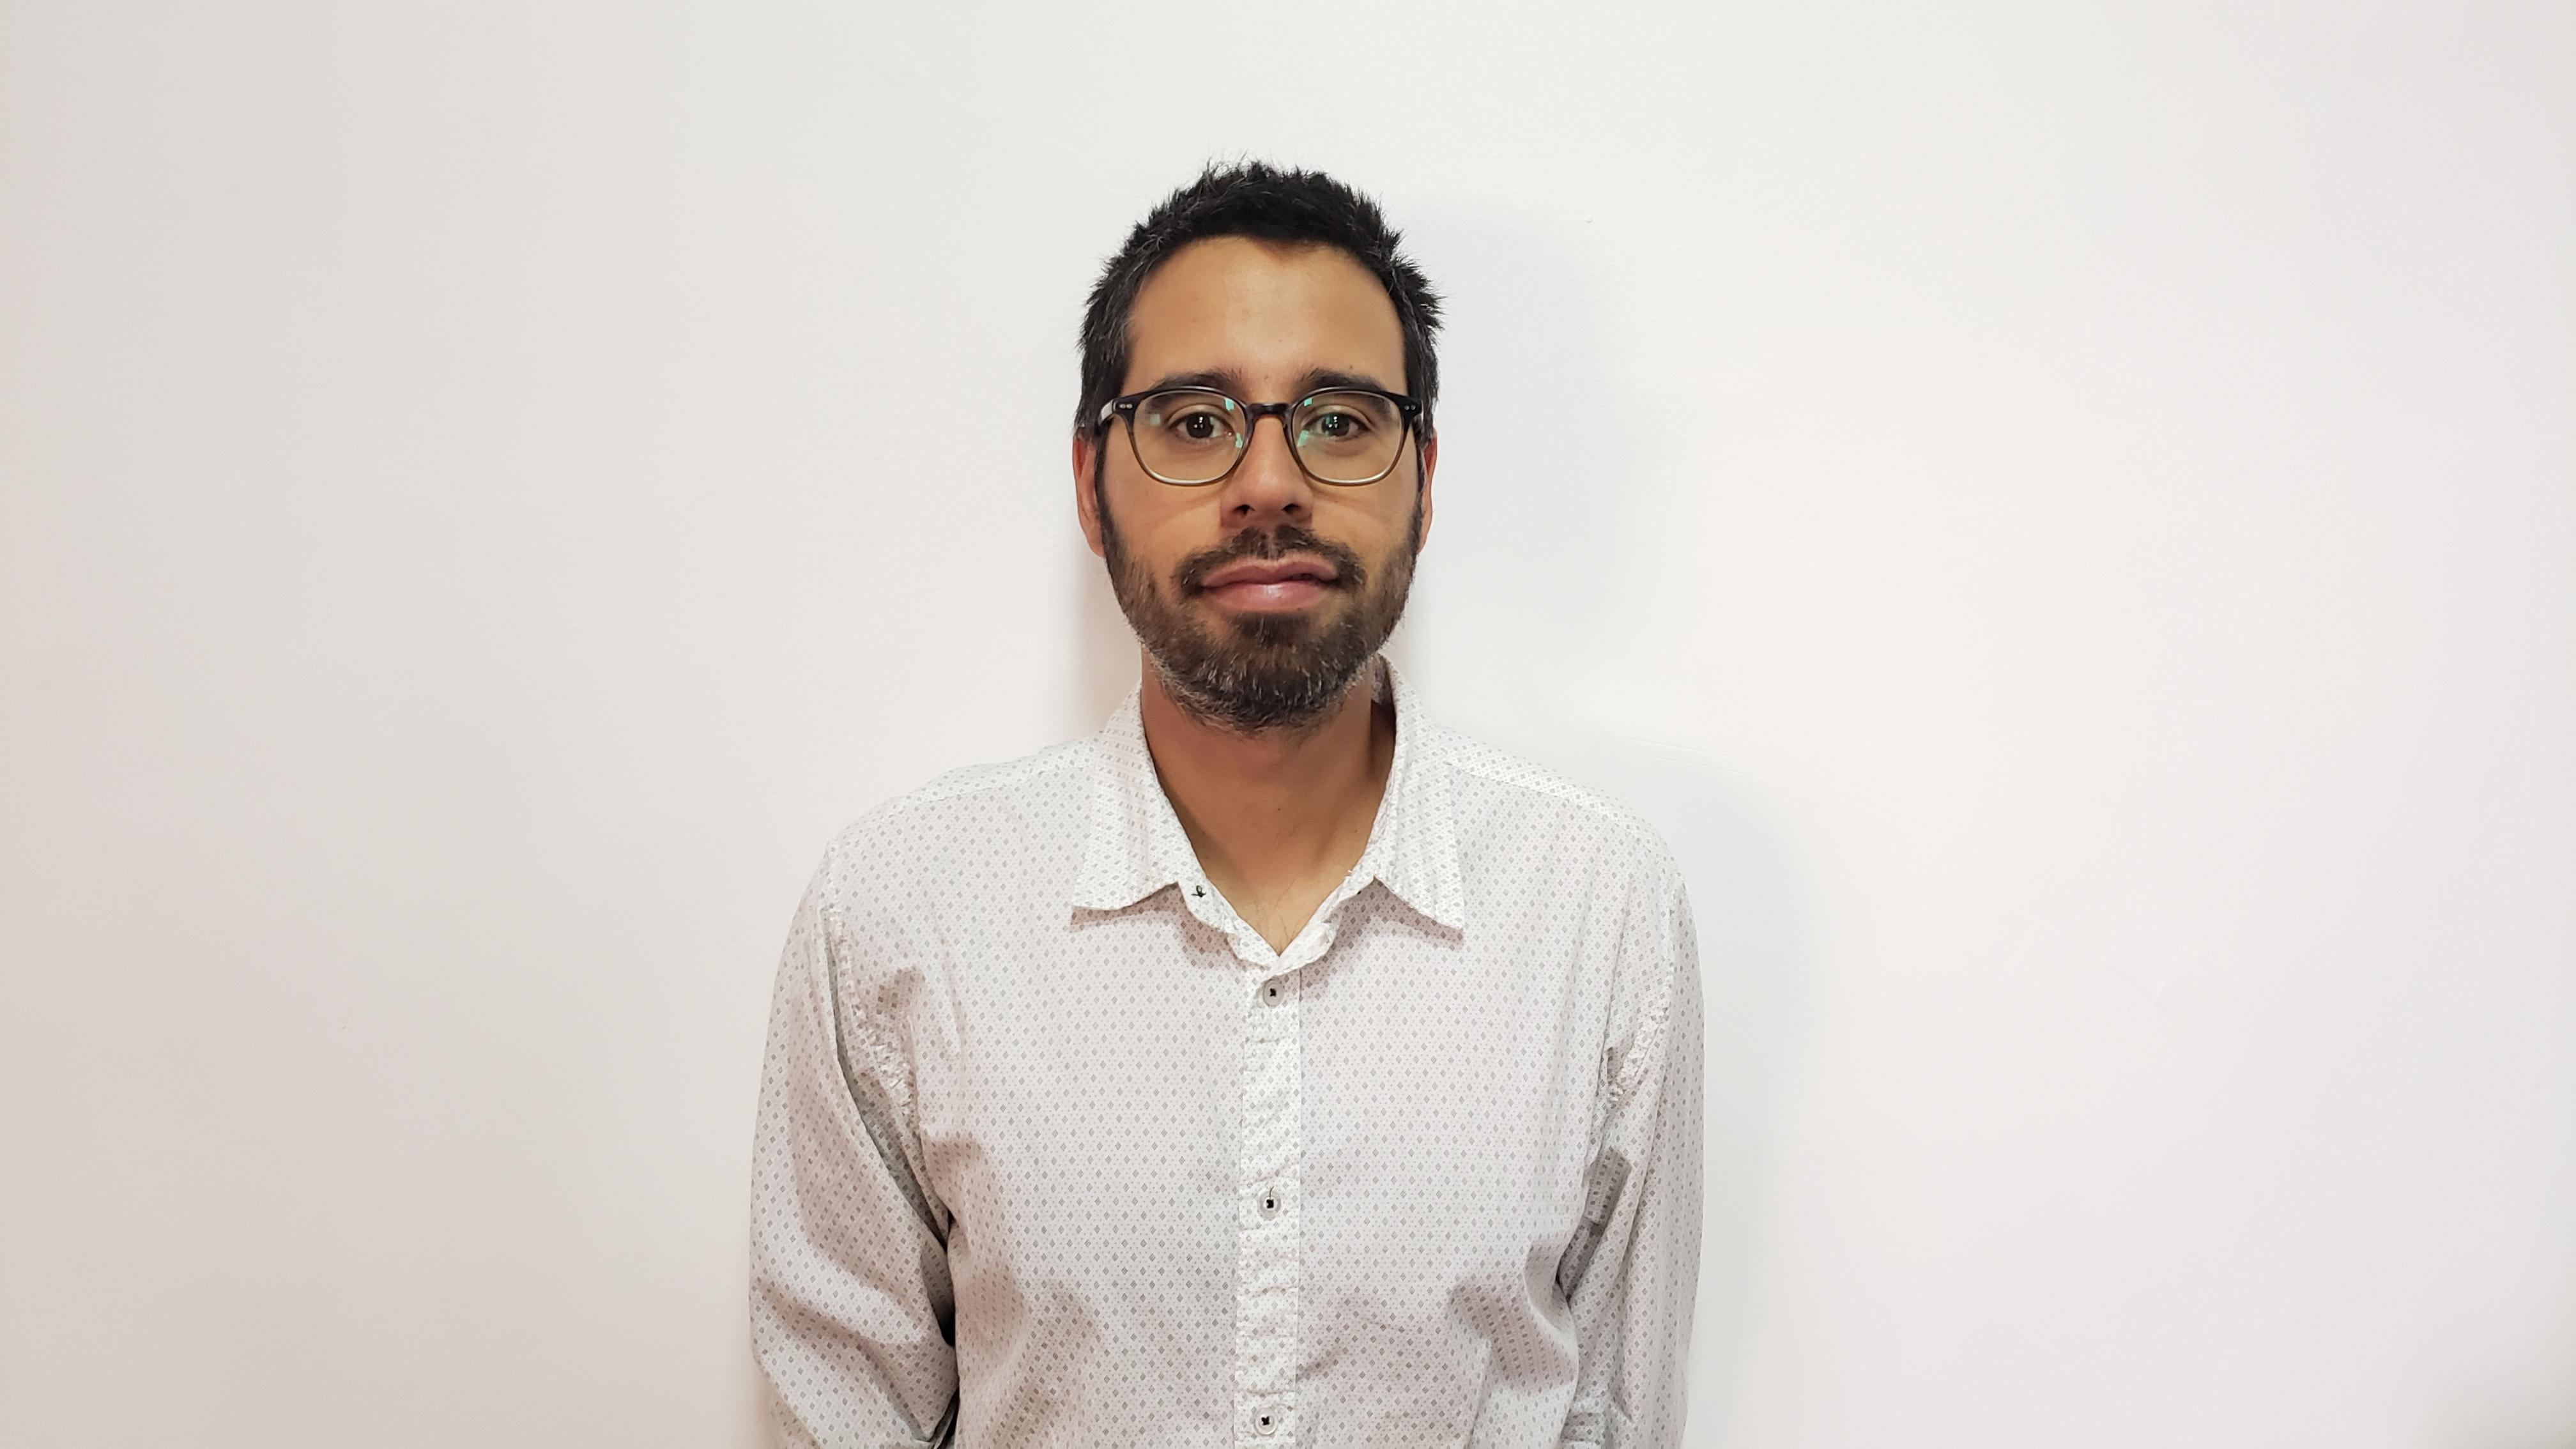 imagen Rodrigo Ignacio Yáñez Rojas